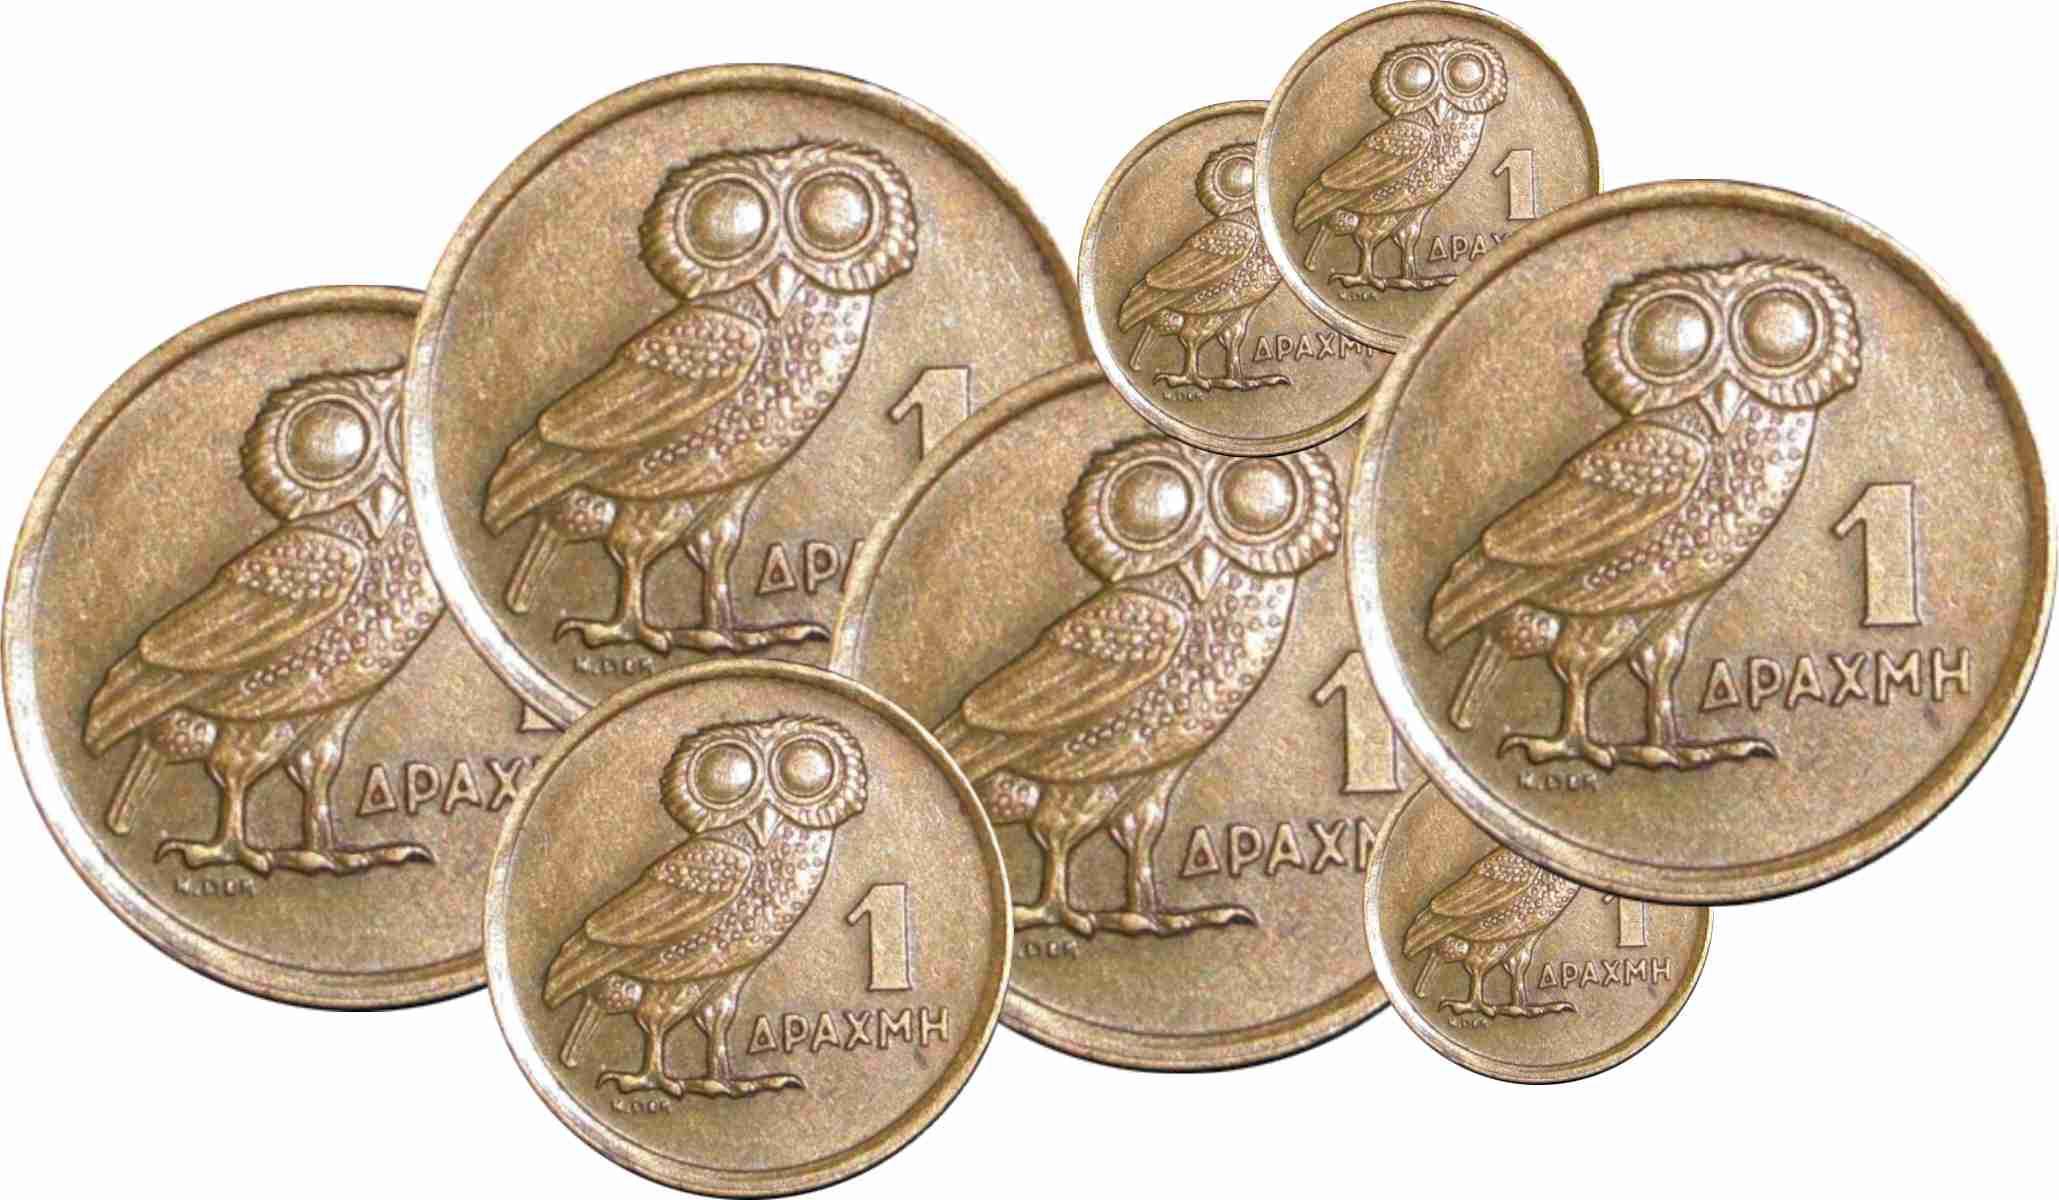 drachmi Ευρώ ή Δραχμή; Ιδού 10 ενδιαφέρουσες απαντήσεις!